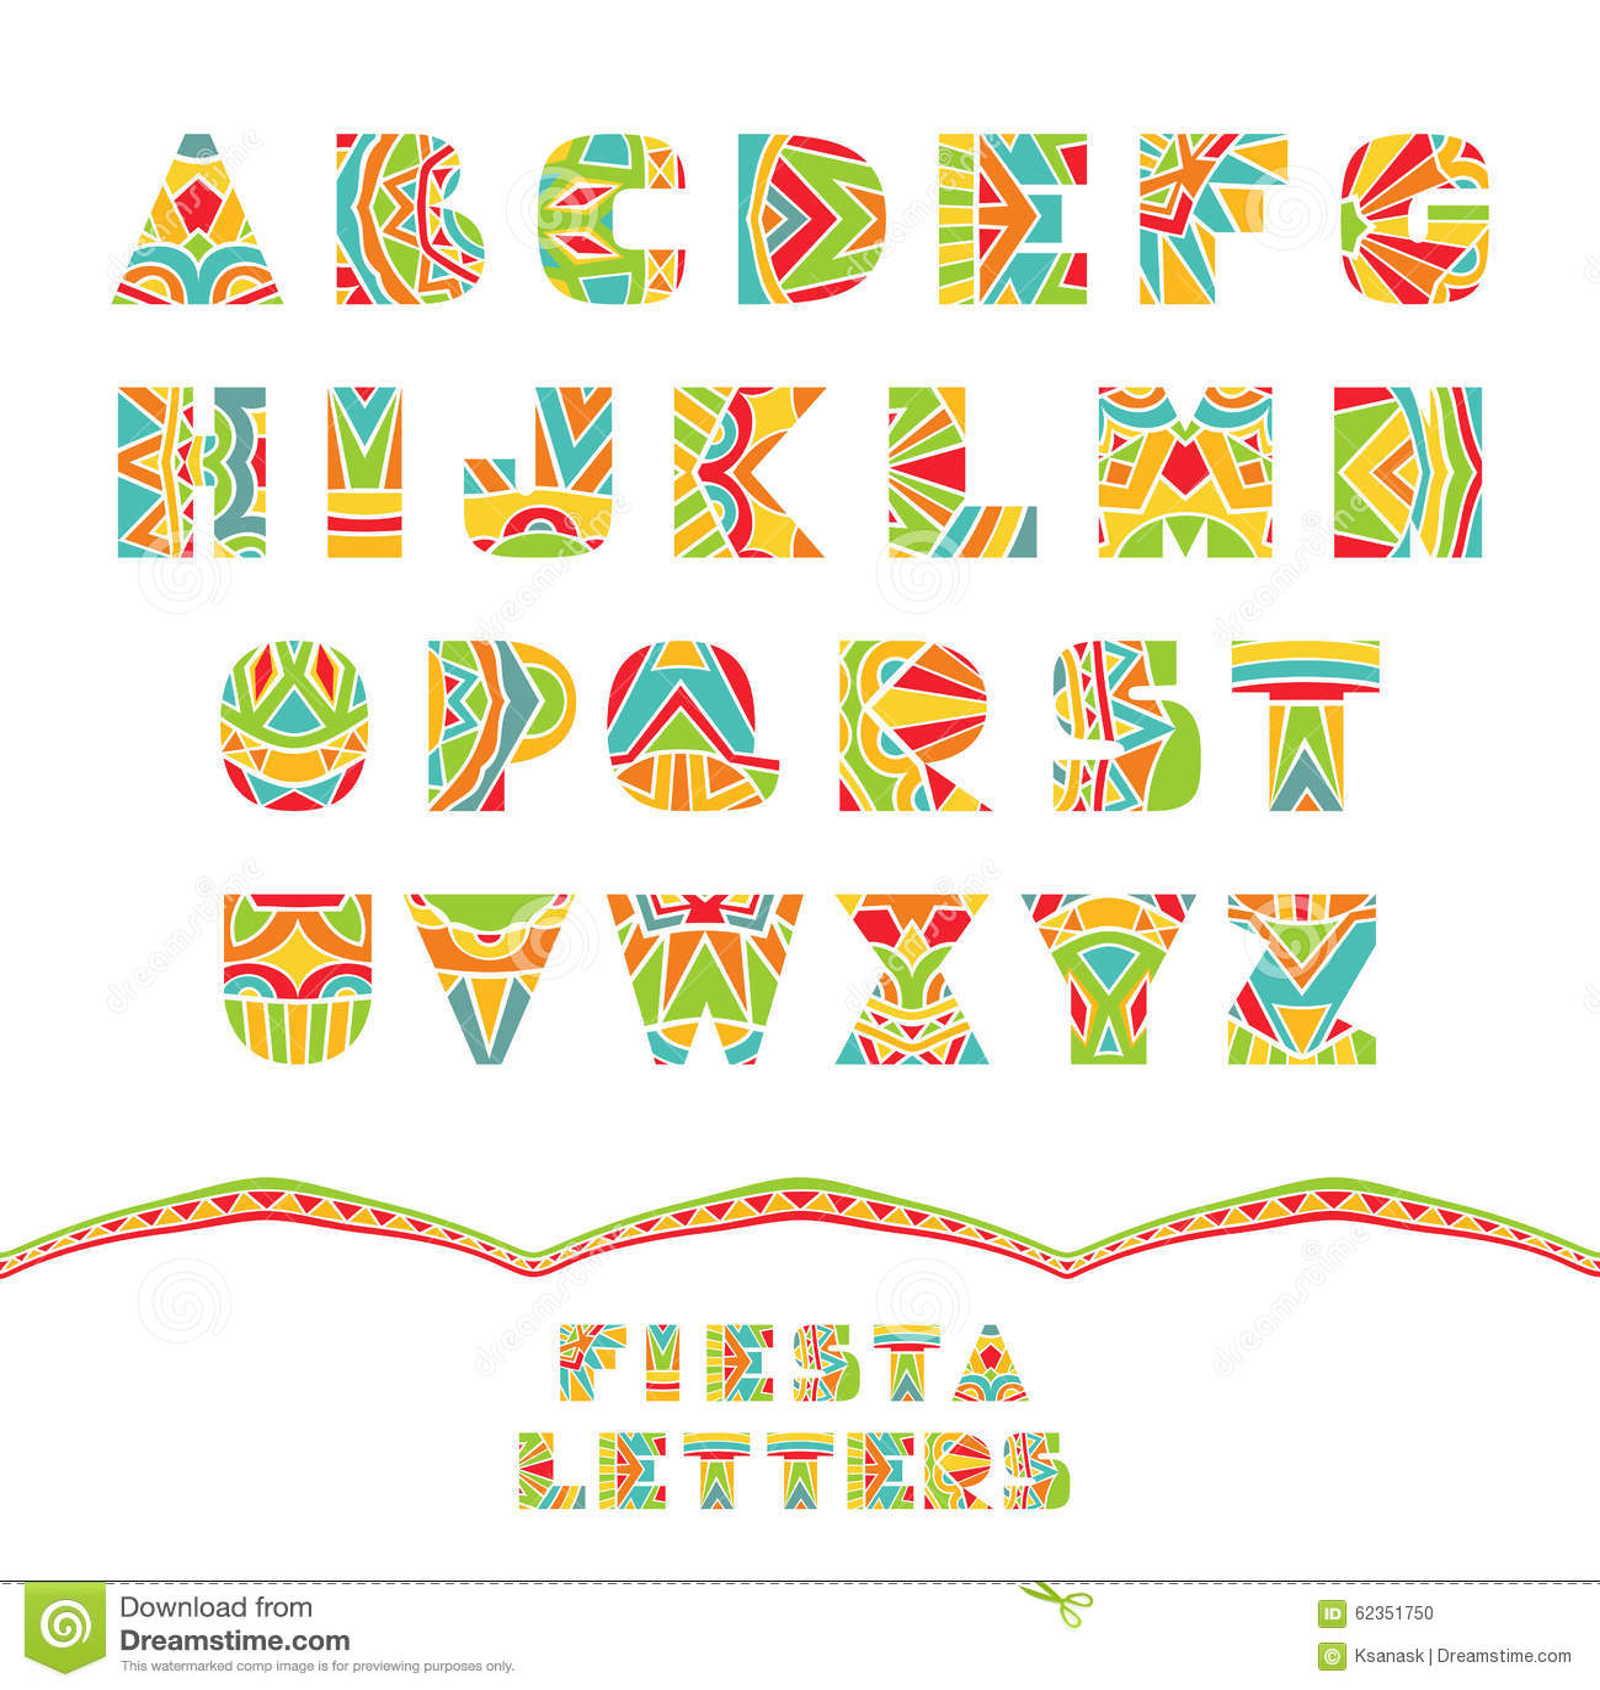 Fall Leaves Clip Art Wallpaper Fiesta Font Stock Vector Image 62351750